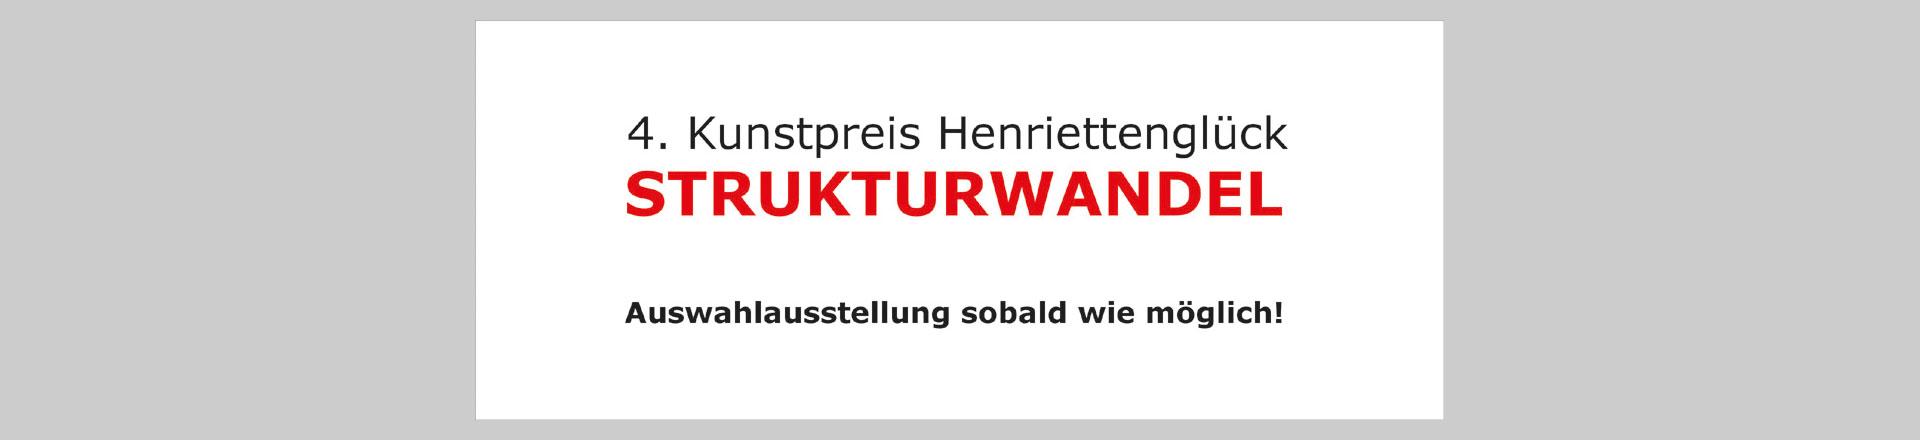 Henriettenglück 4